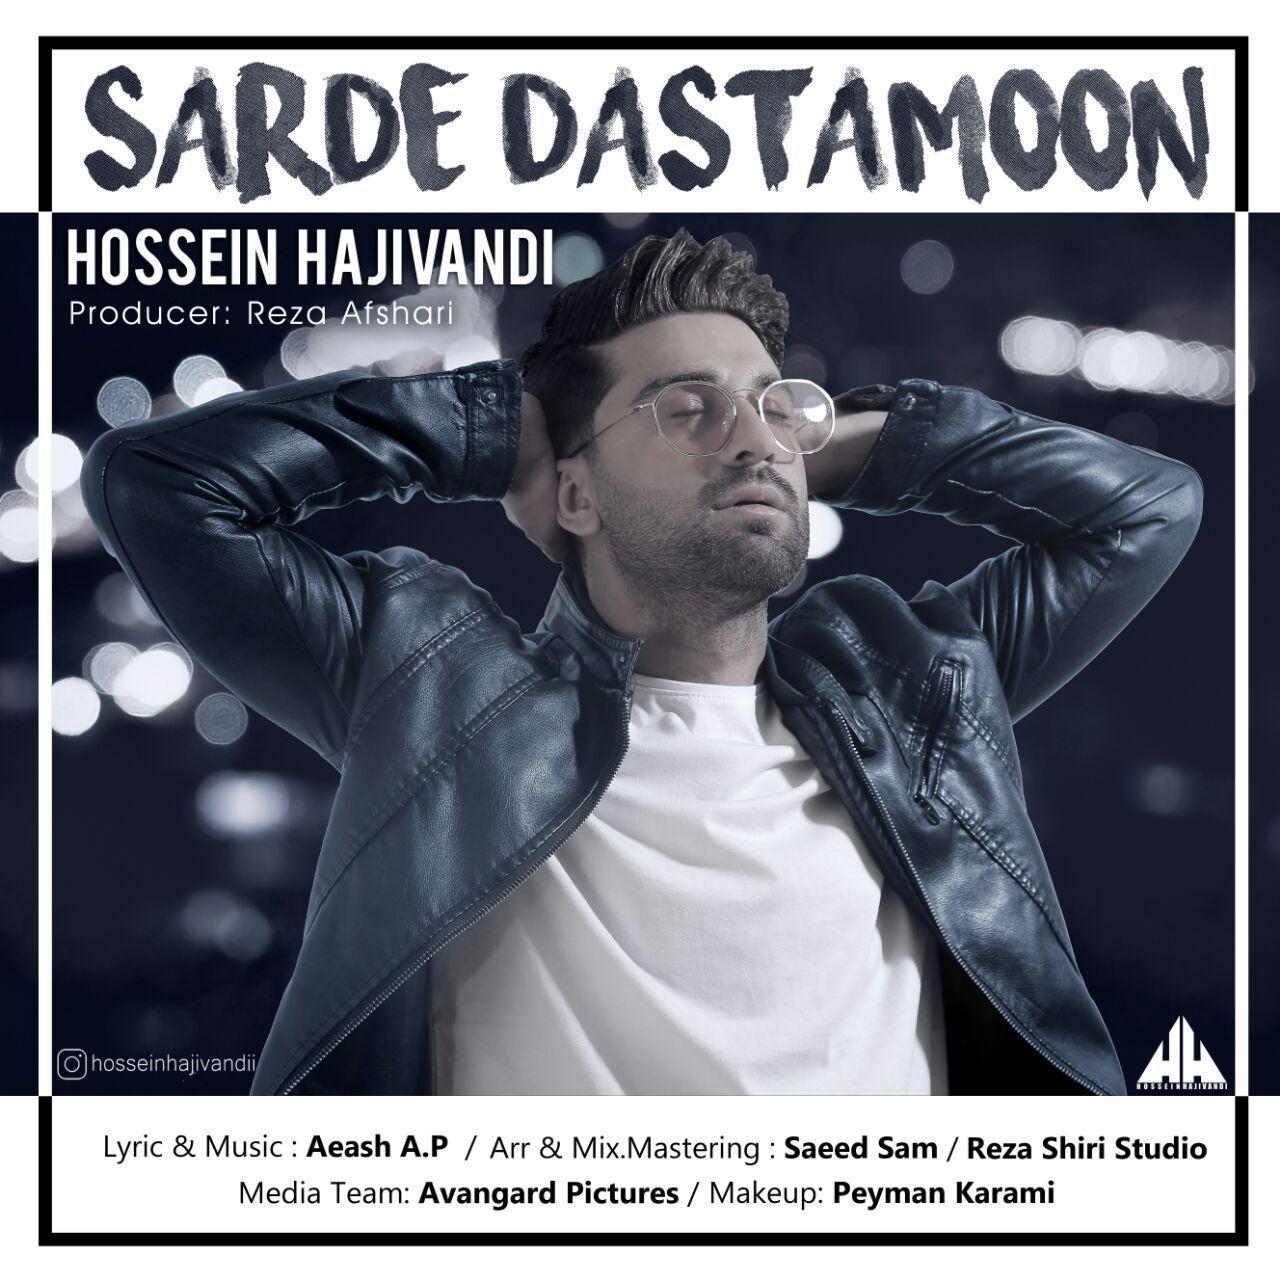 Hossein Hajivandi – Sarde Dastamoon